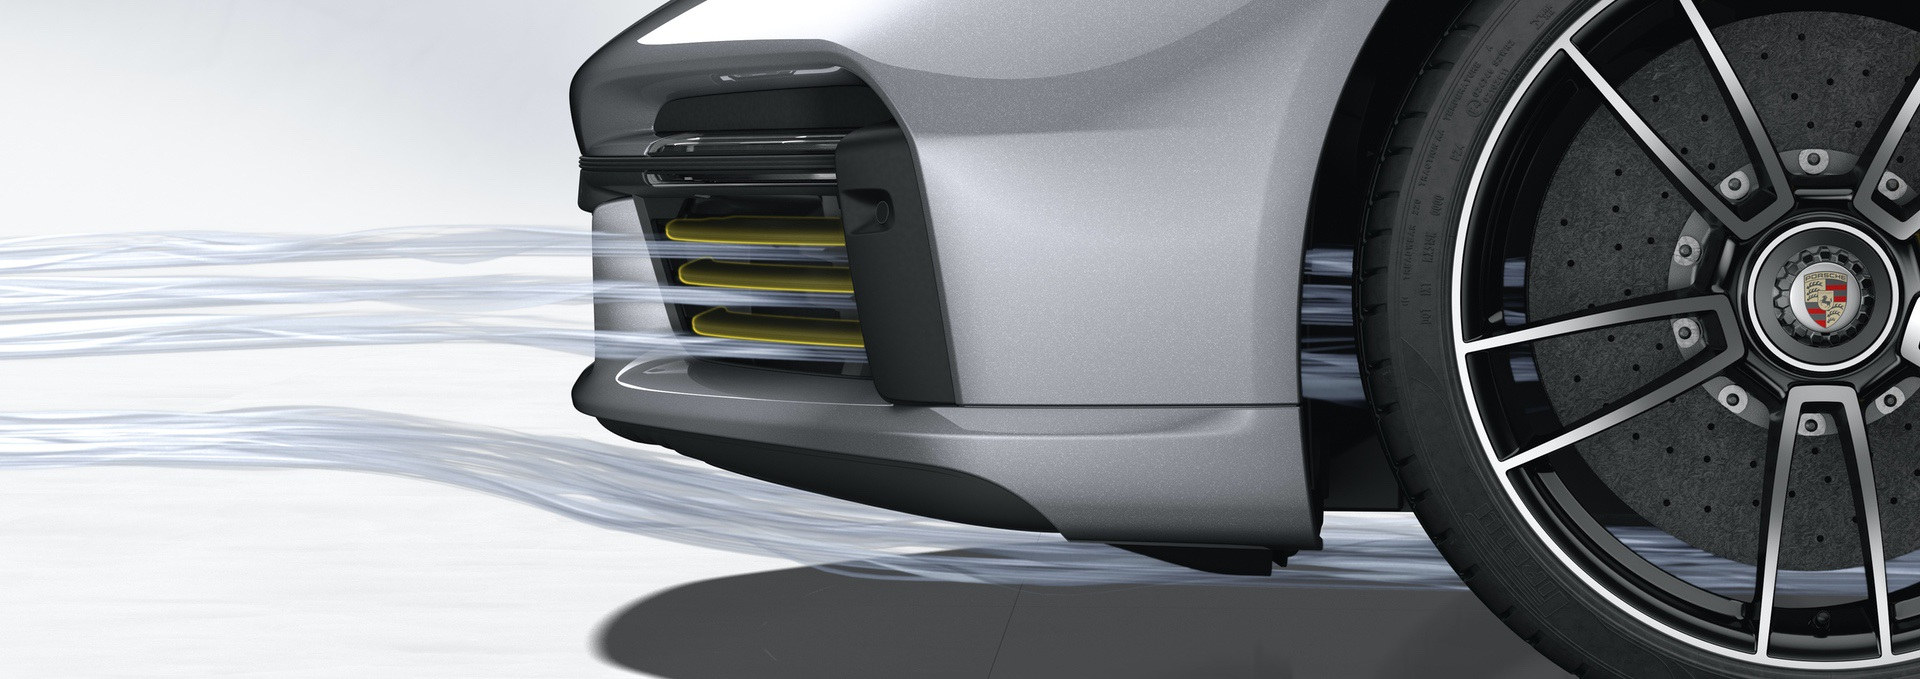 2020_Porsche_911-Turbo_S-aerodynamics_0000